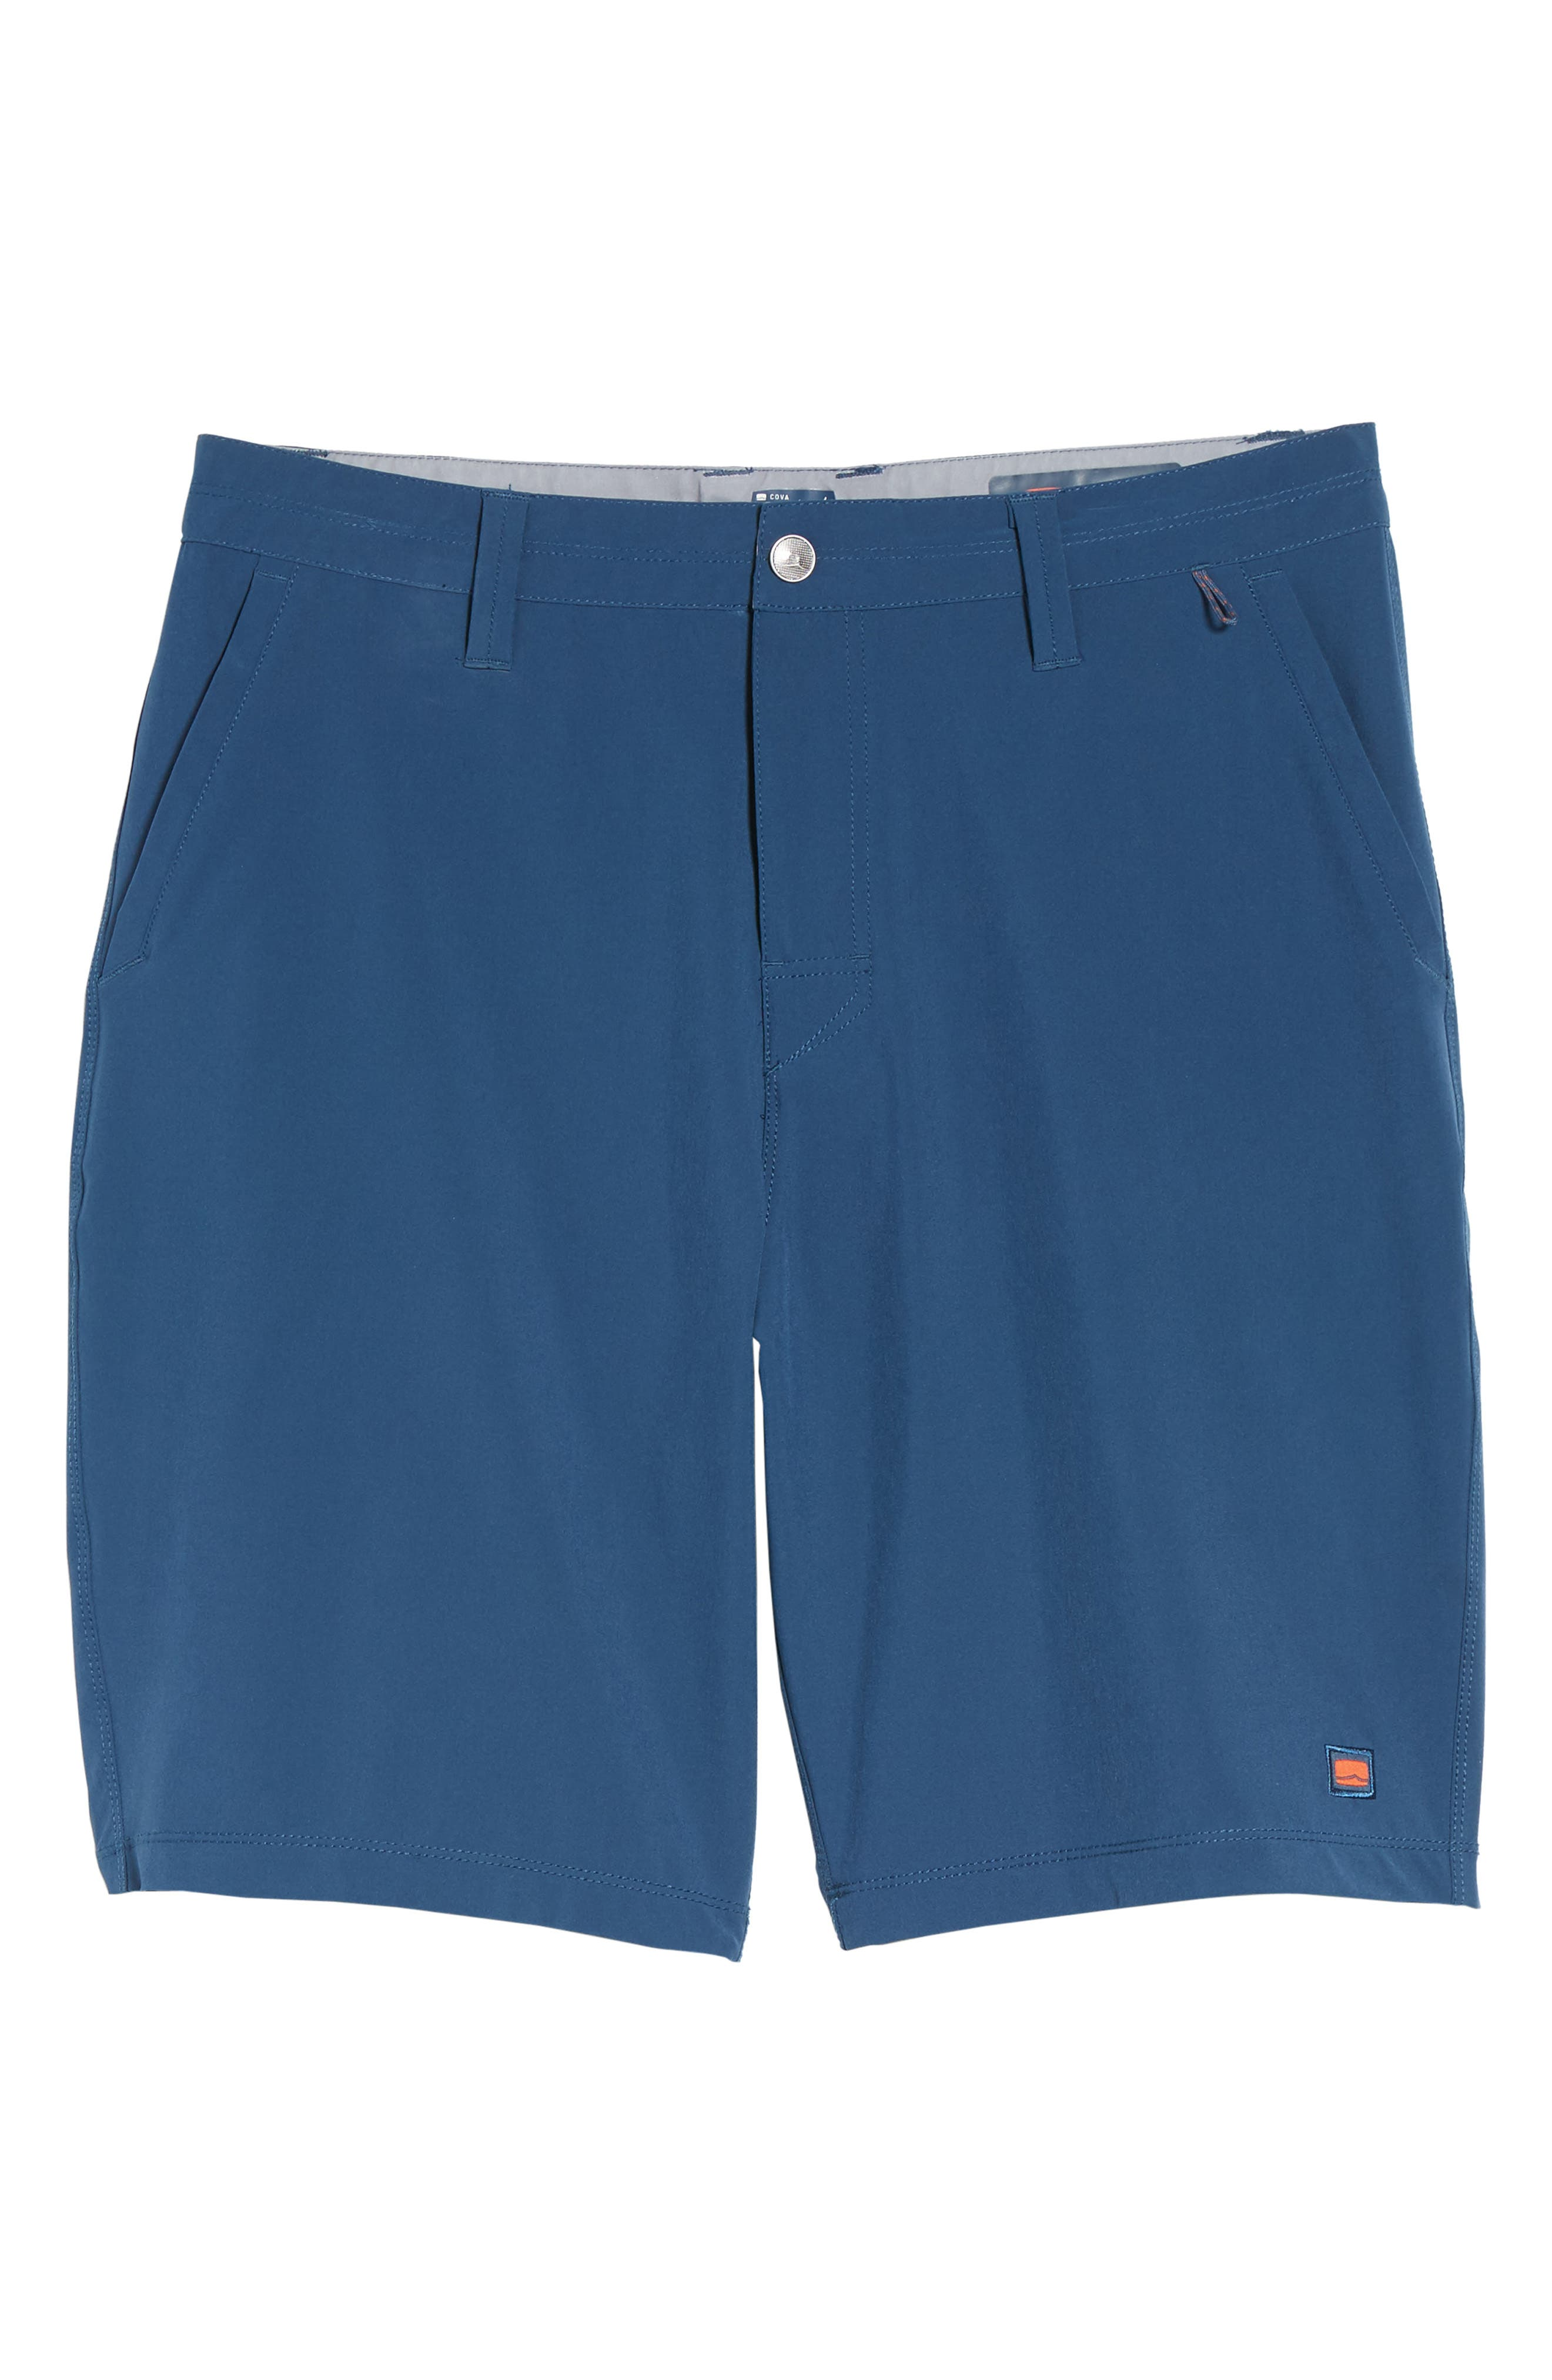 Coast Regular Fit Hybrid Shorts,                             Alternate thumbnail 6, color,                             DEEP SEA